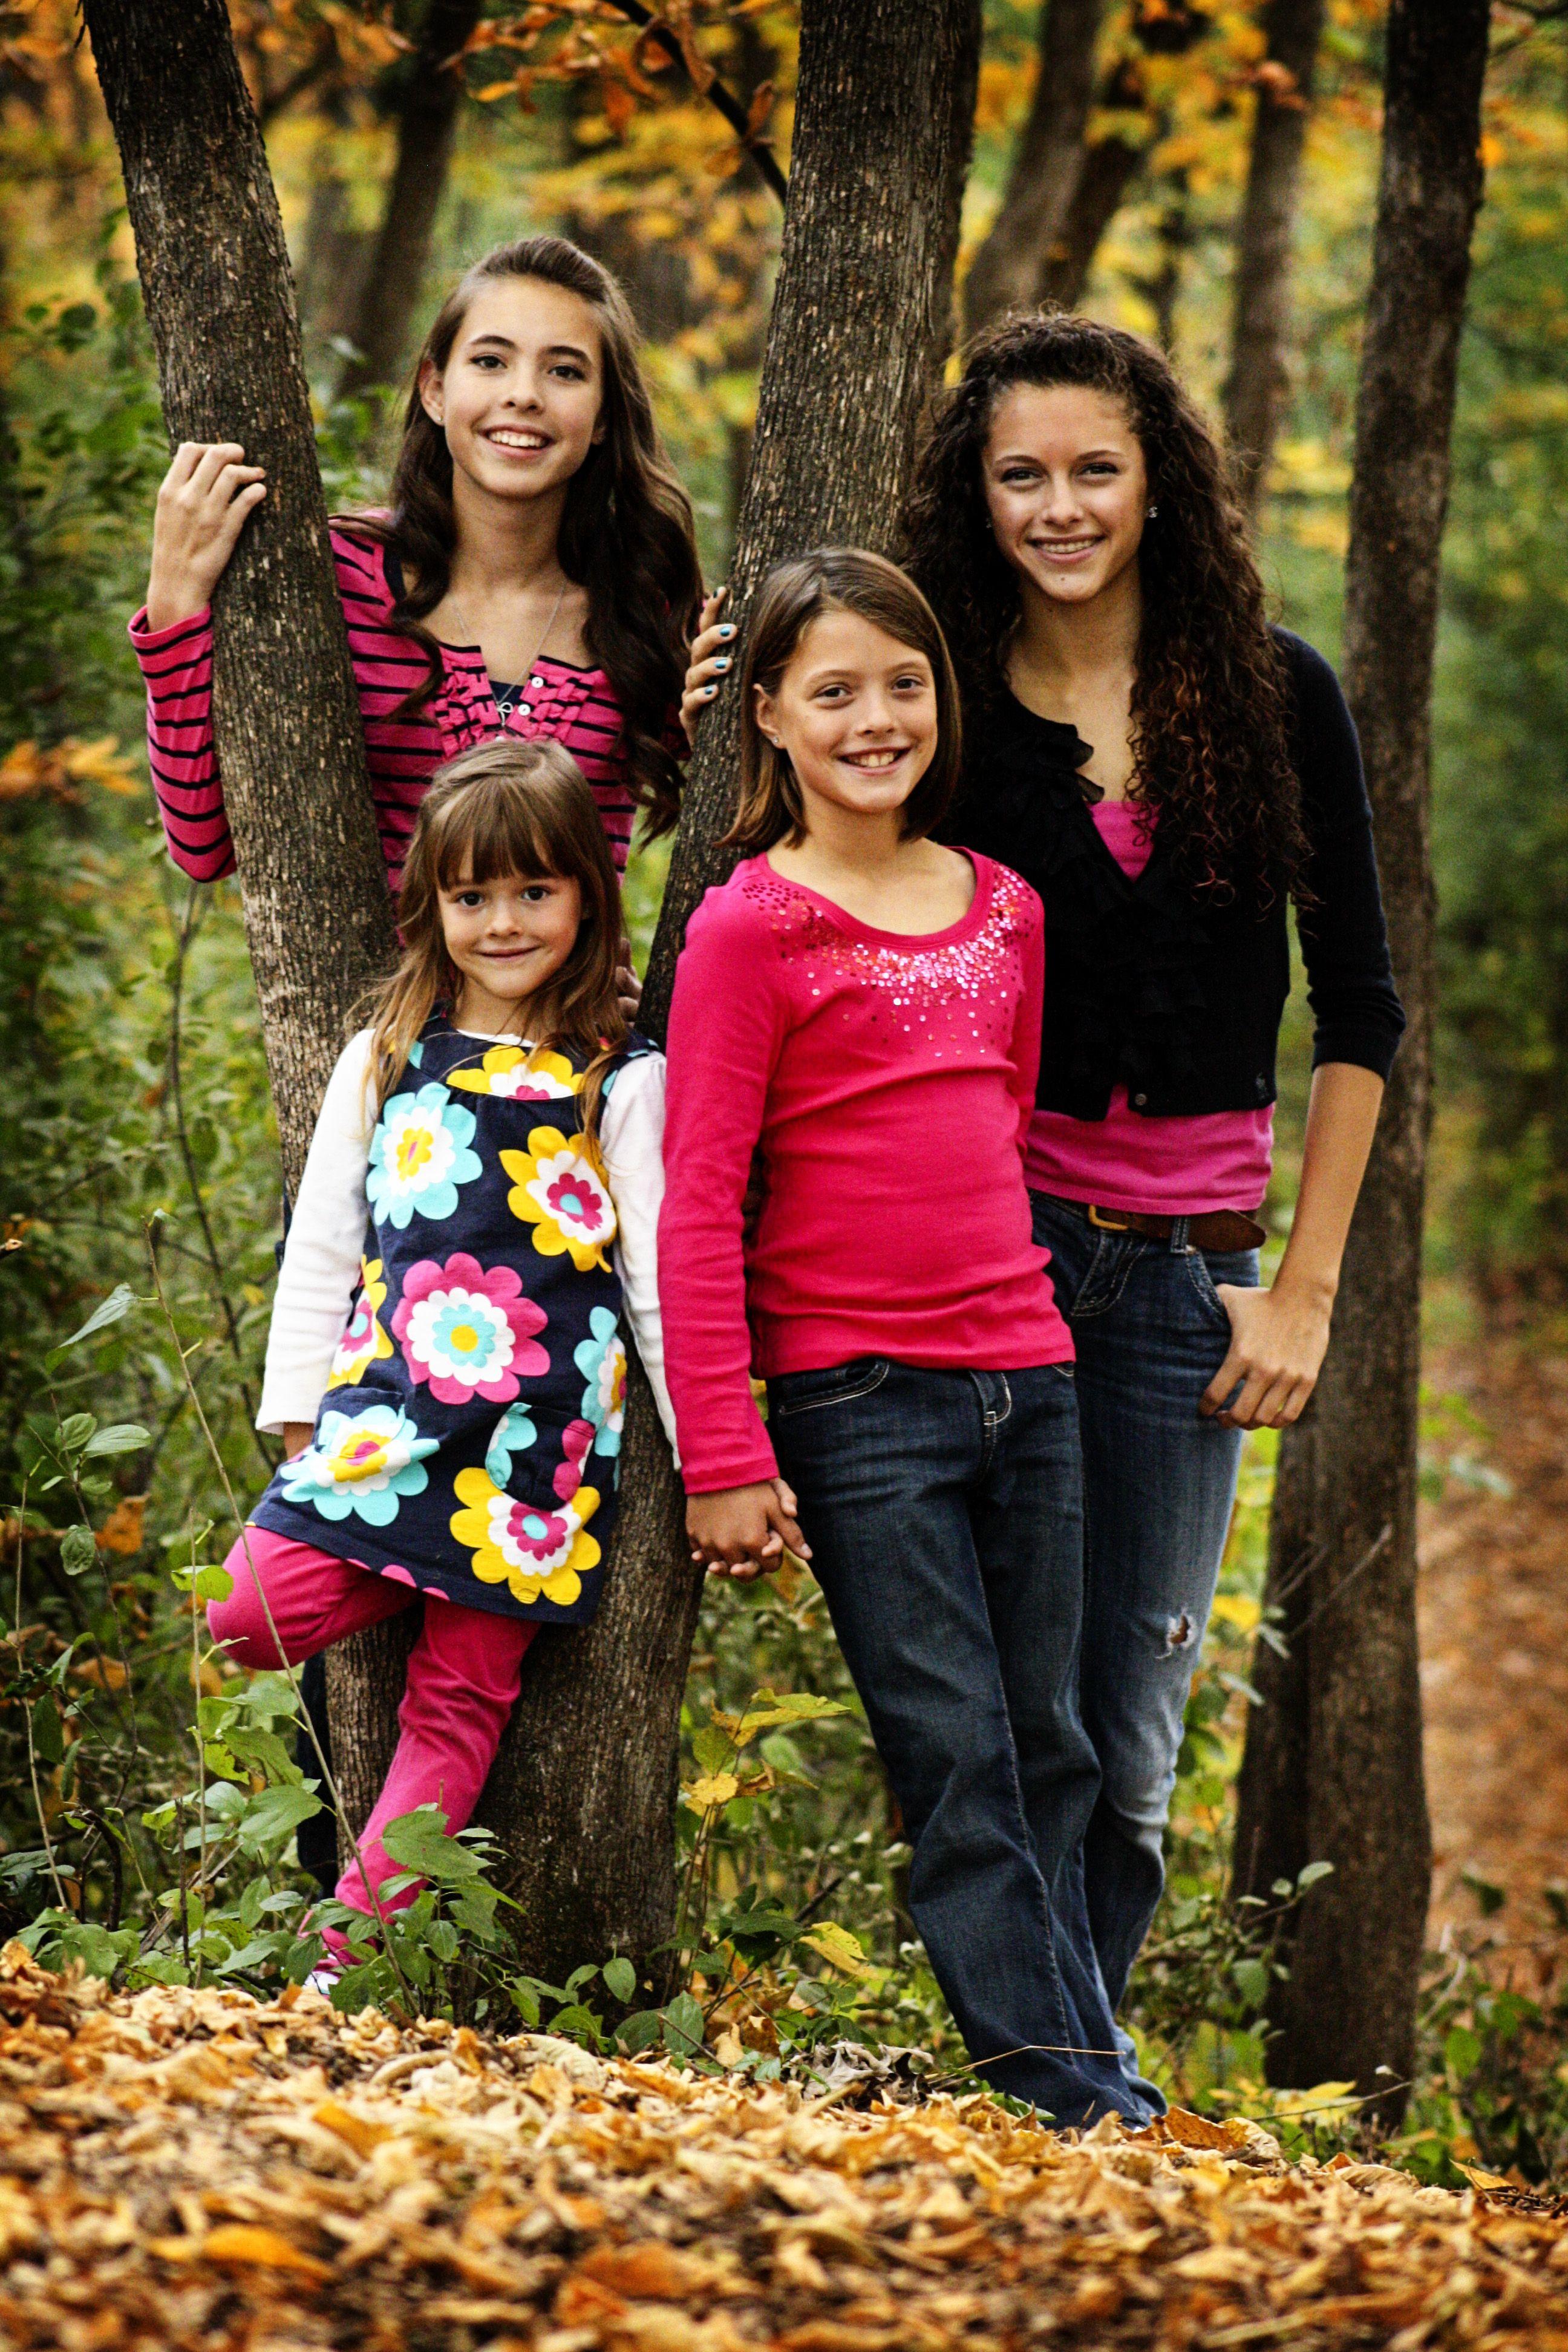 My Fall Family Photos » | Photography Poses | Pinterest | Fall ...